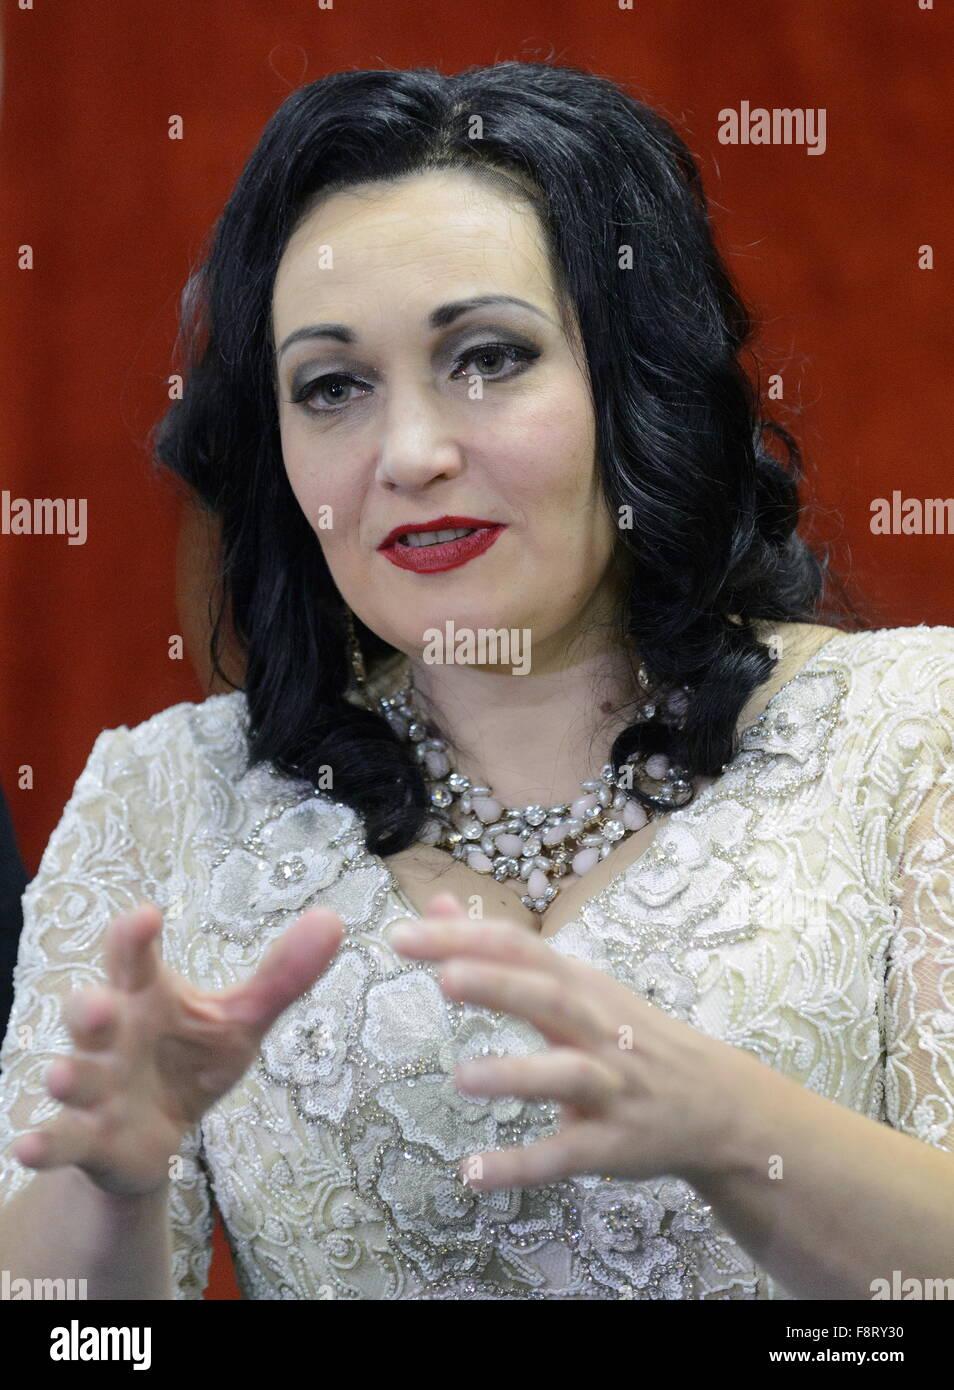 Moscow, Russia. 11th Dec, 2015. Soprano Dina Kuznetsova looks on after a dress rehearsal of Handel's Rodelinda - Stock Image